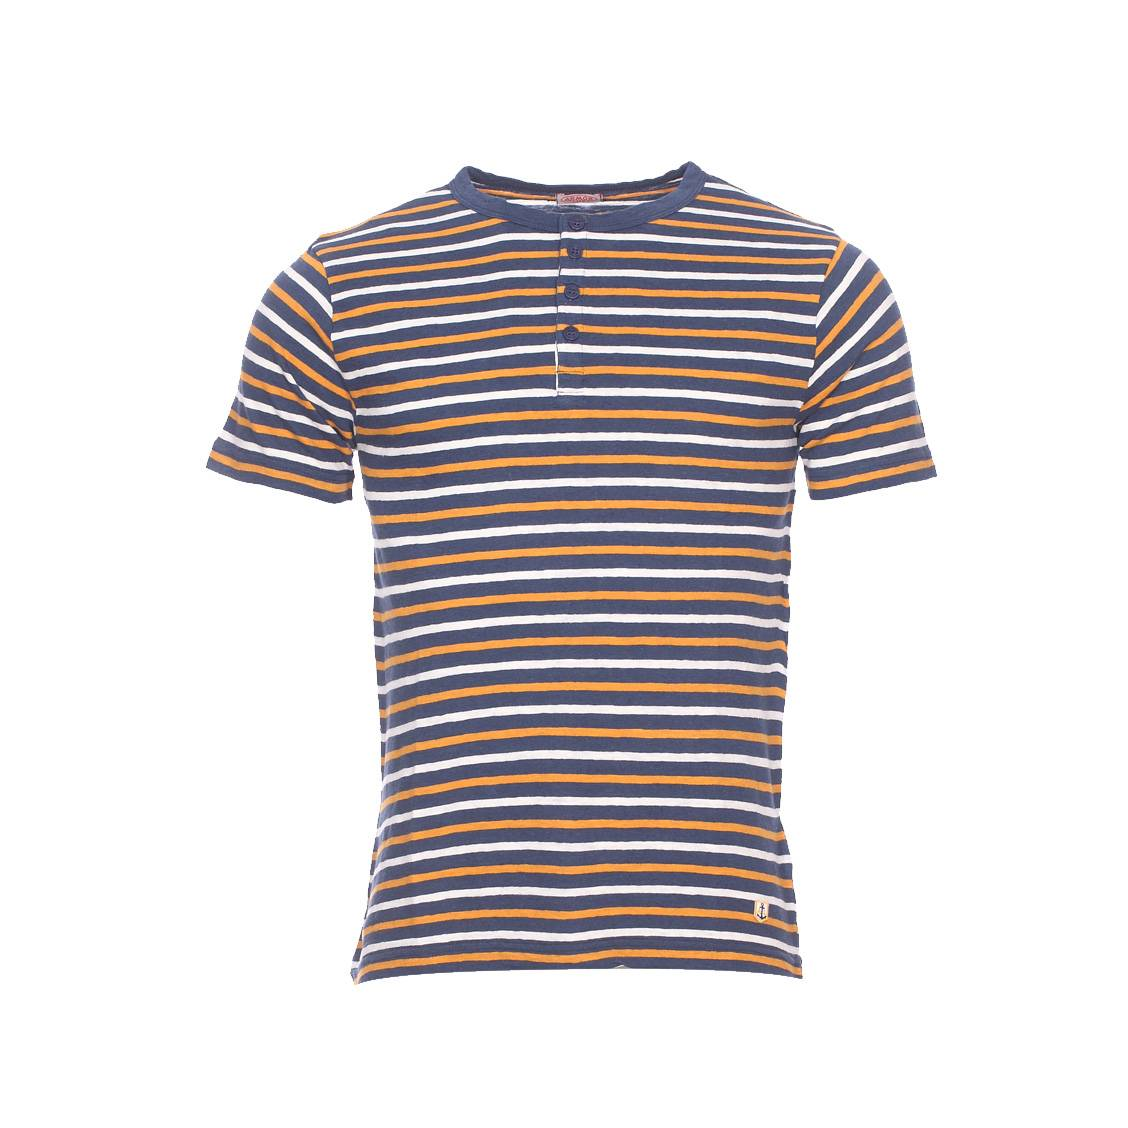 tee shirt col tunisien armor lux en coton et en lin bleu marine rayures blanches et jaune. Black Bedroom Furniture Sets. Home Design Ideas